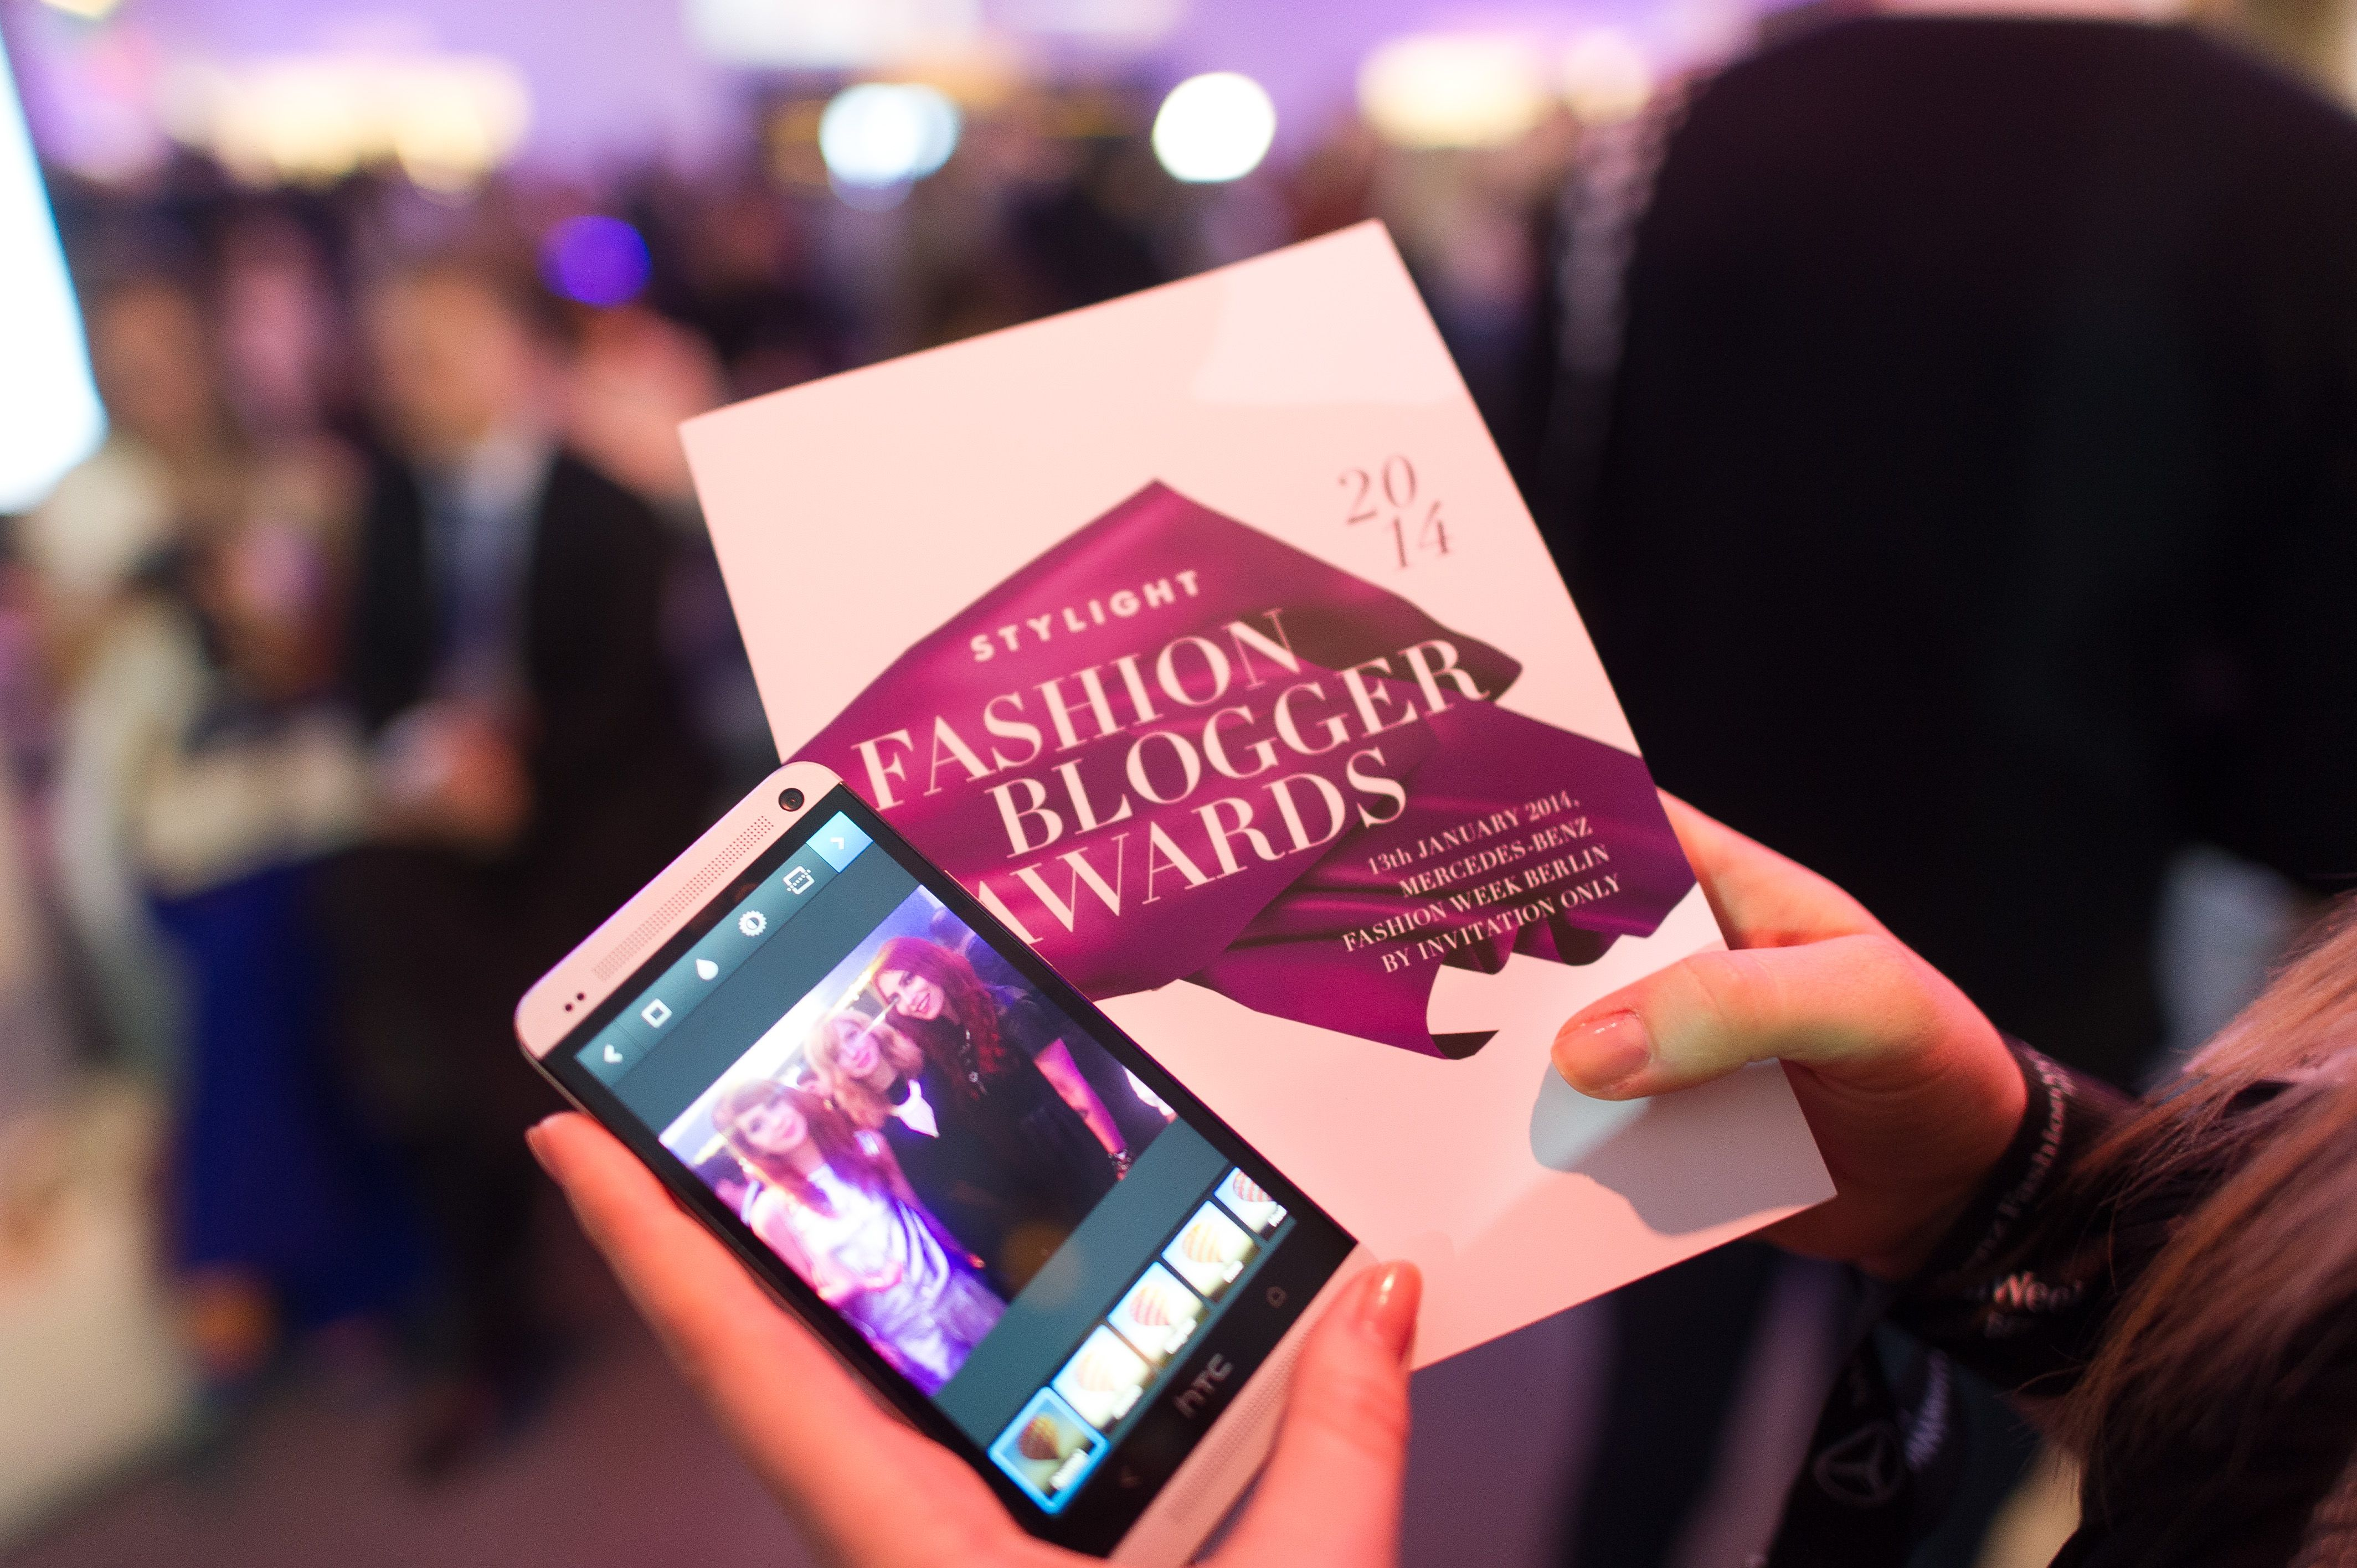 #stylight #stylightfashionbloggerawards #berlin #fashion #stylightfba #mbfwberlin #mbfwb #blogger #bloggers #purple #invitation #event #instagram #phone